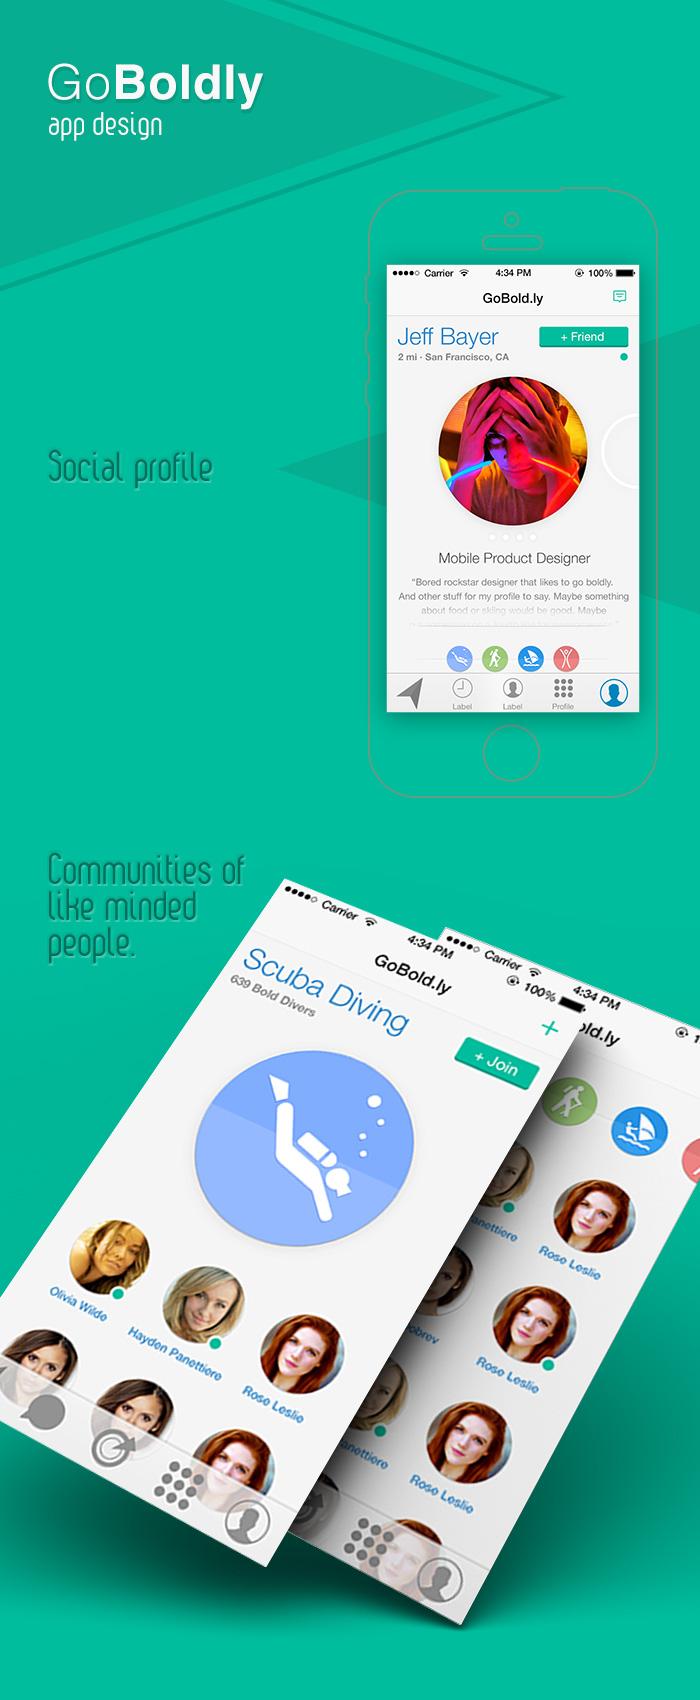 GoBoldly app design